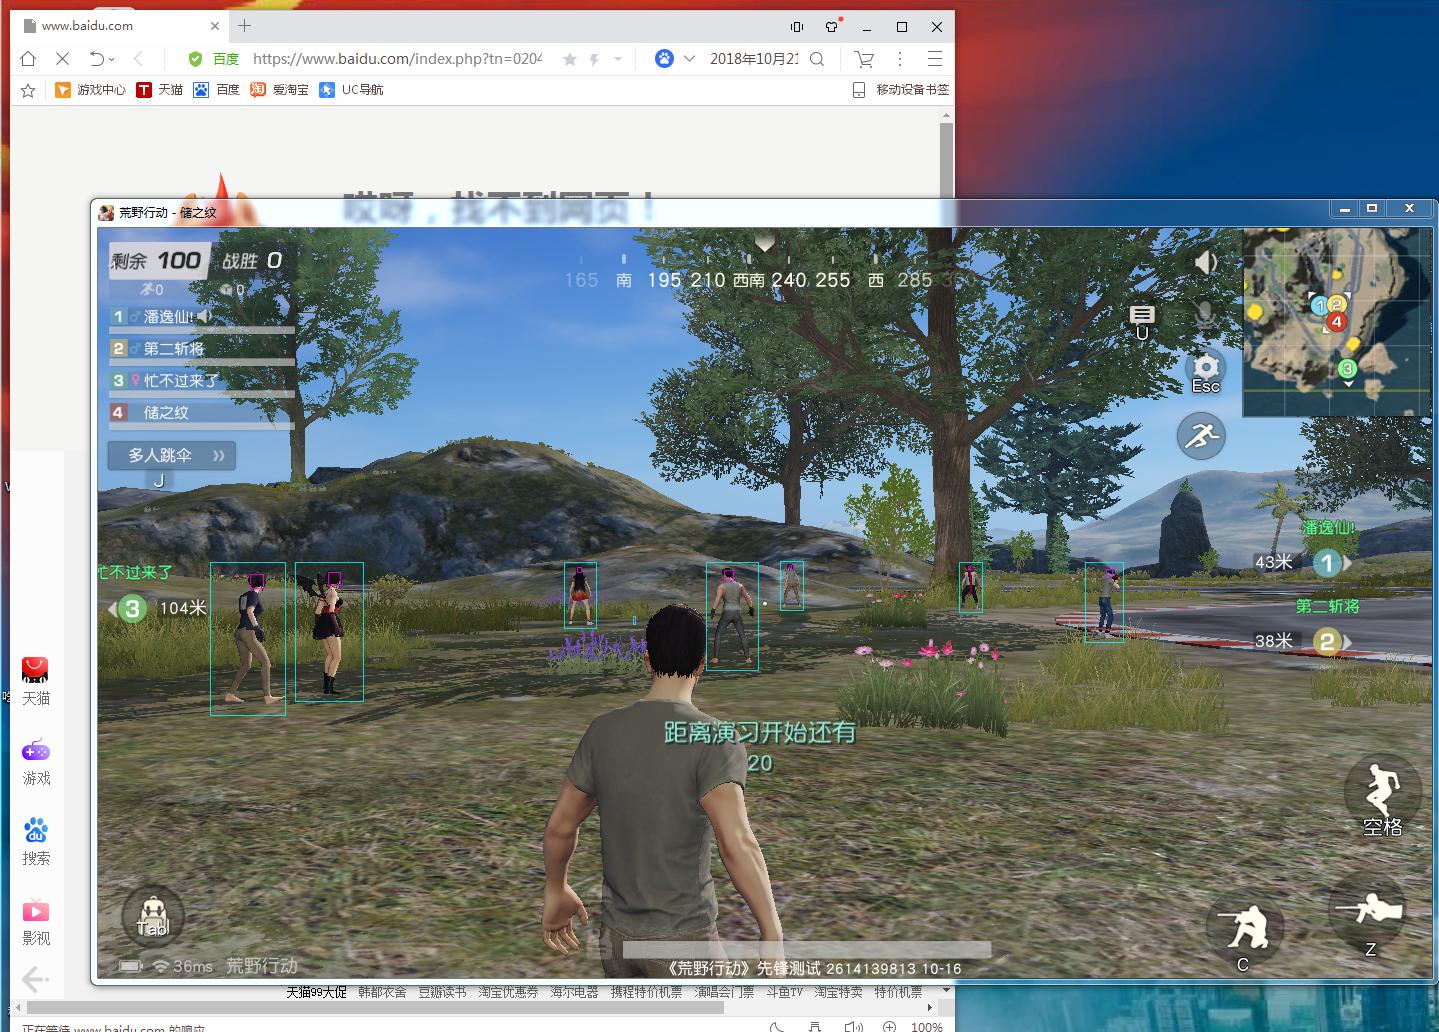 PC荒野行动蓝屏透视自瞄破解版